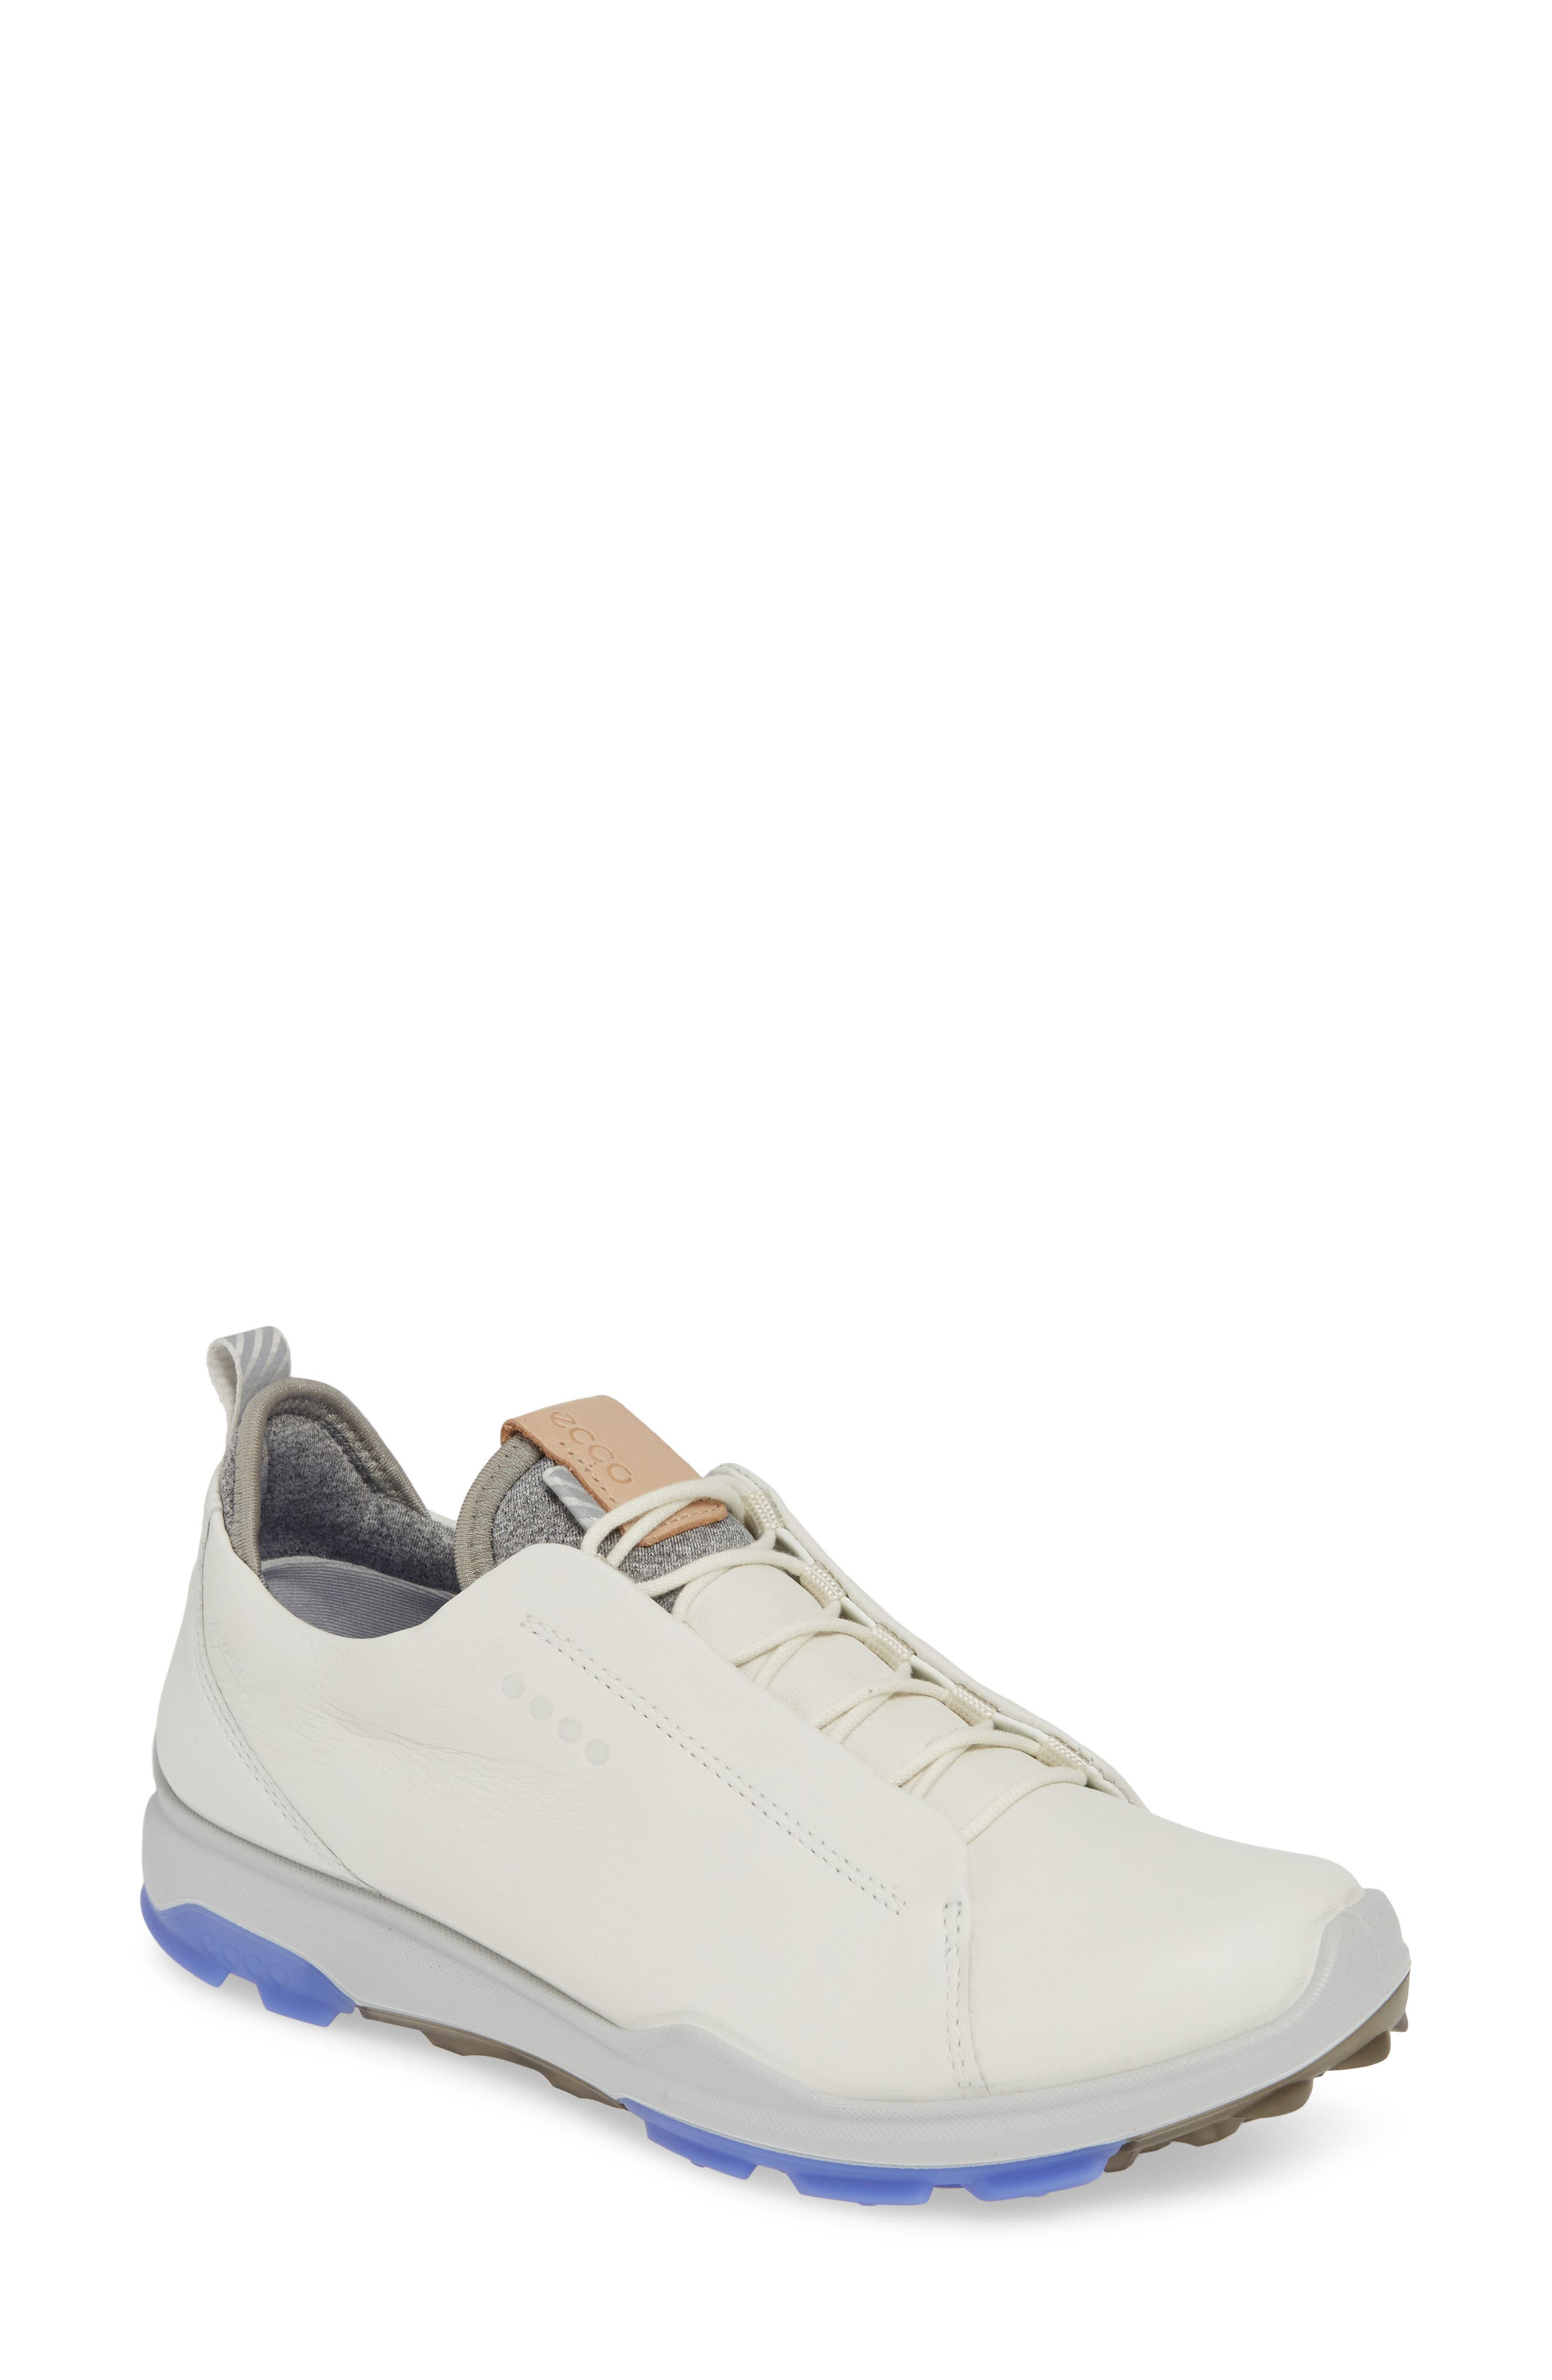 Ecco Biom Hybrid Gore-Tex Golf Shoe, White